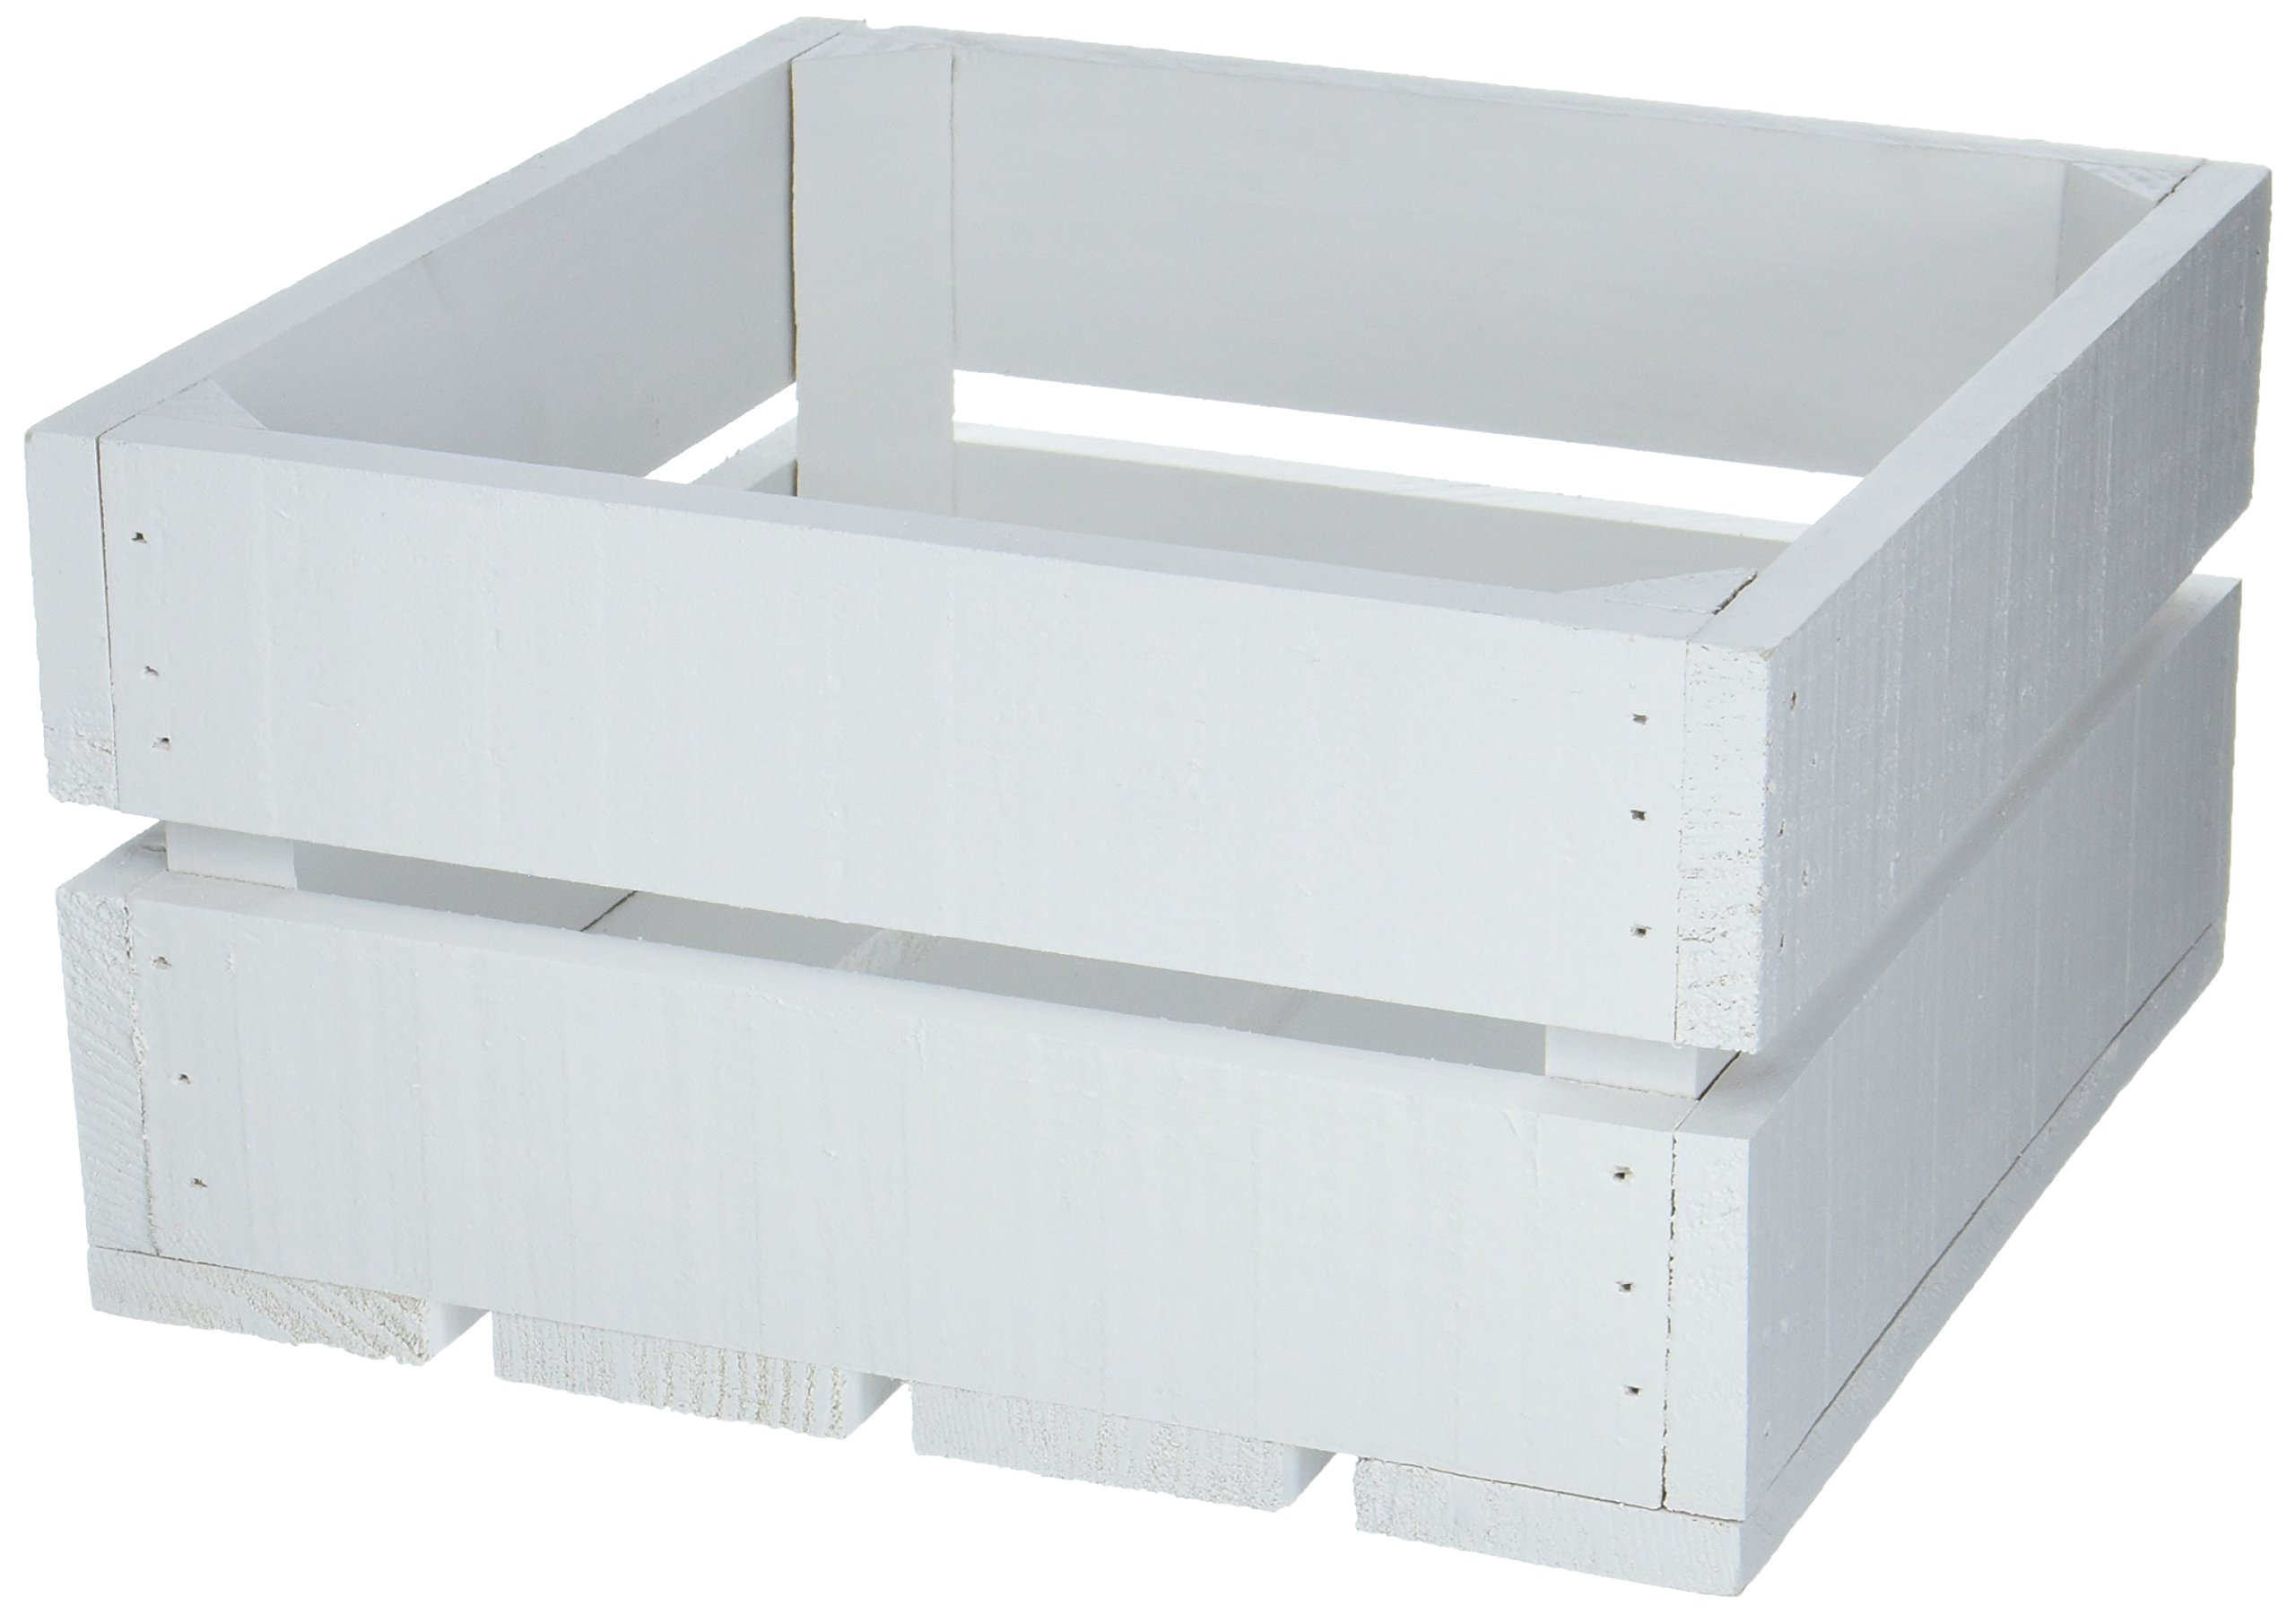 Caja de Madera Decorativa de Madera Blanca